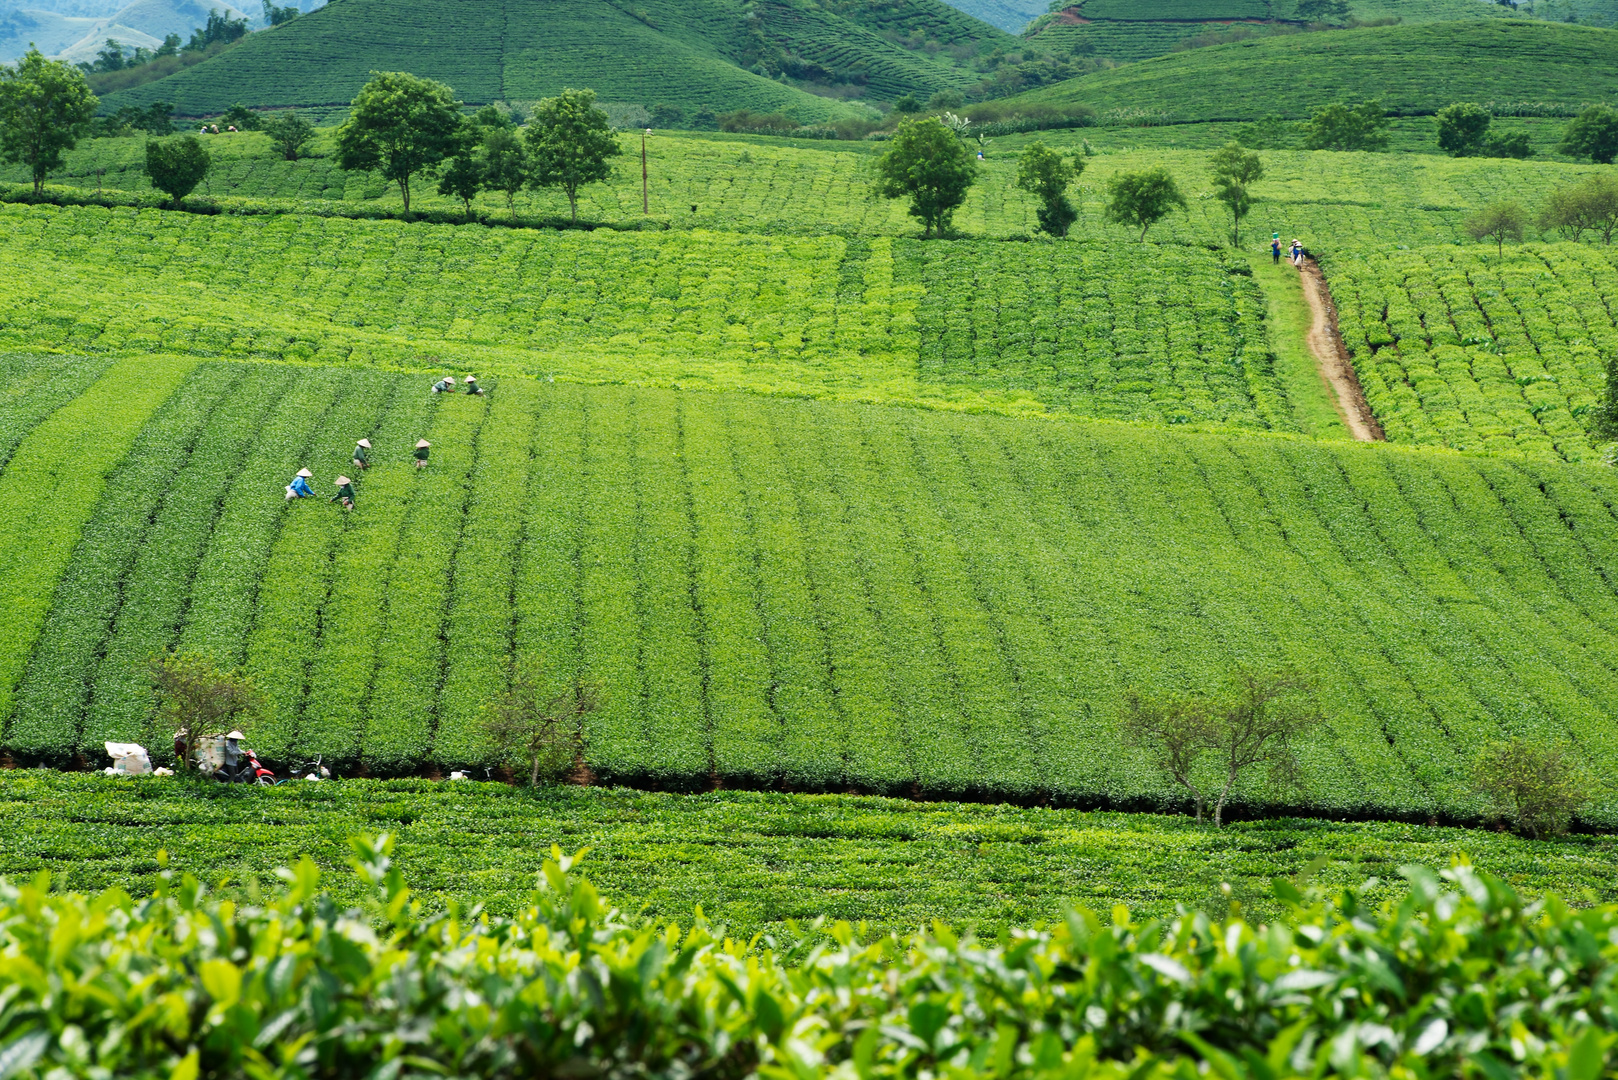 Teeplantage in Moc Chau, Nordvietnam 2010